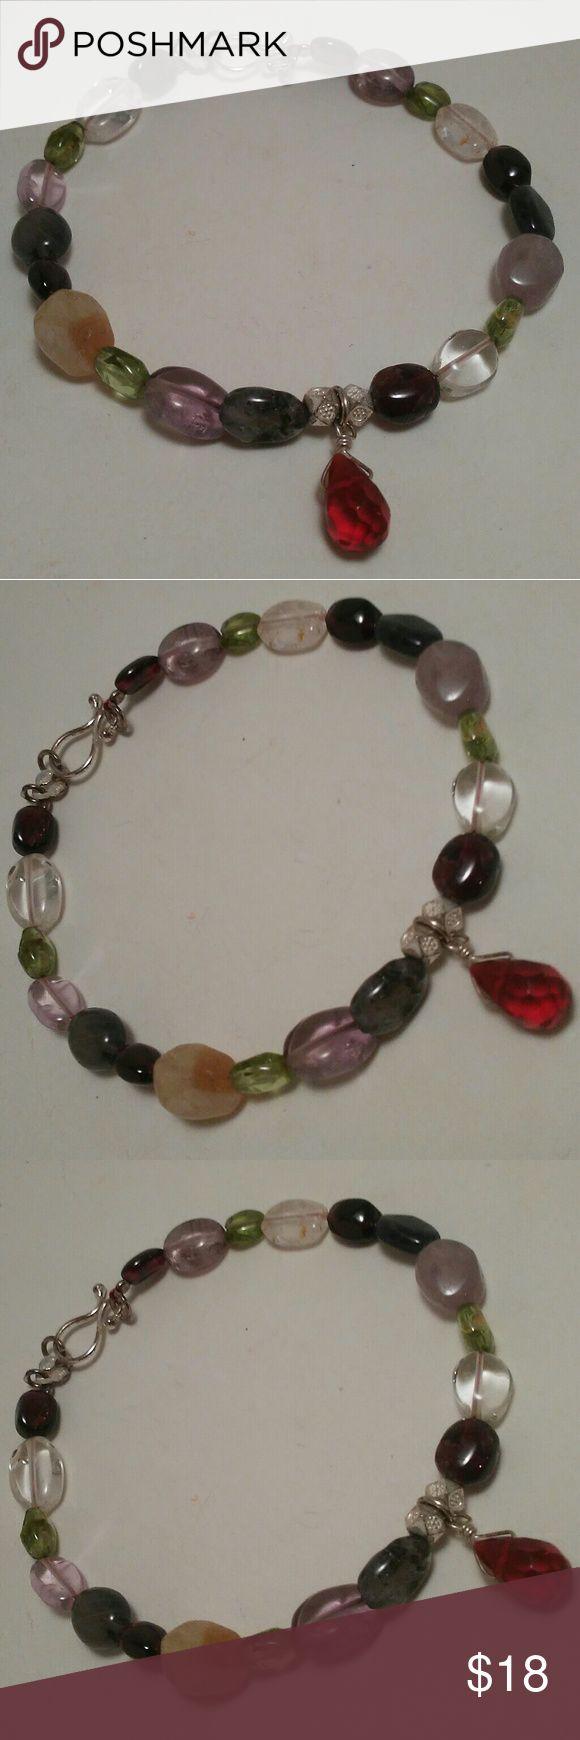 Red Rhinestone Charm beaded stone bracelet Red Rhinestone Charm beaded stone bracelet, 7.5 inches Jewelry Bracelets